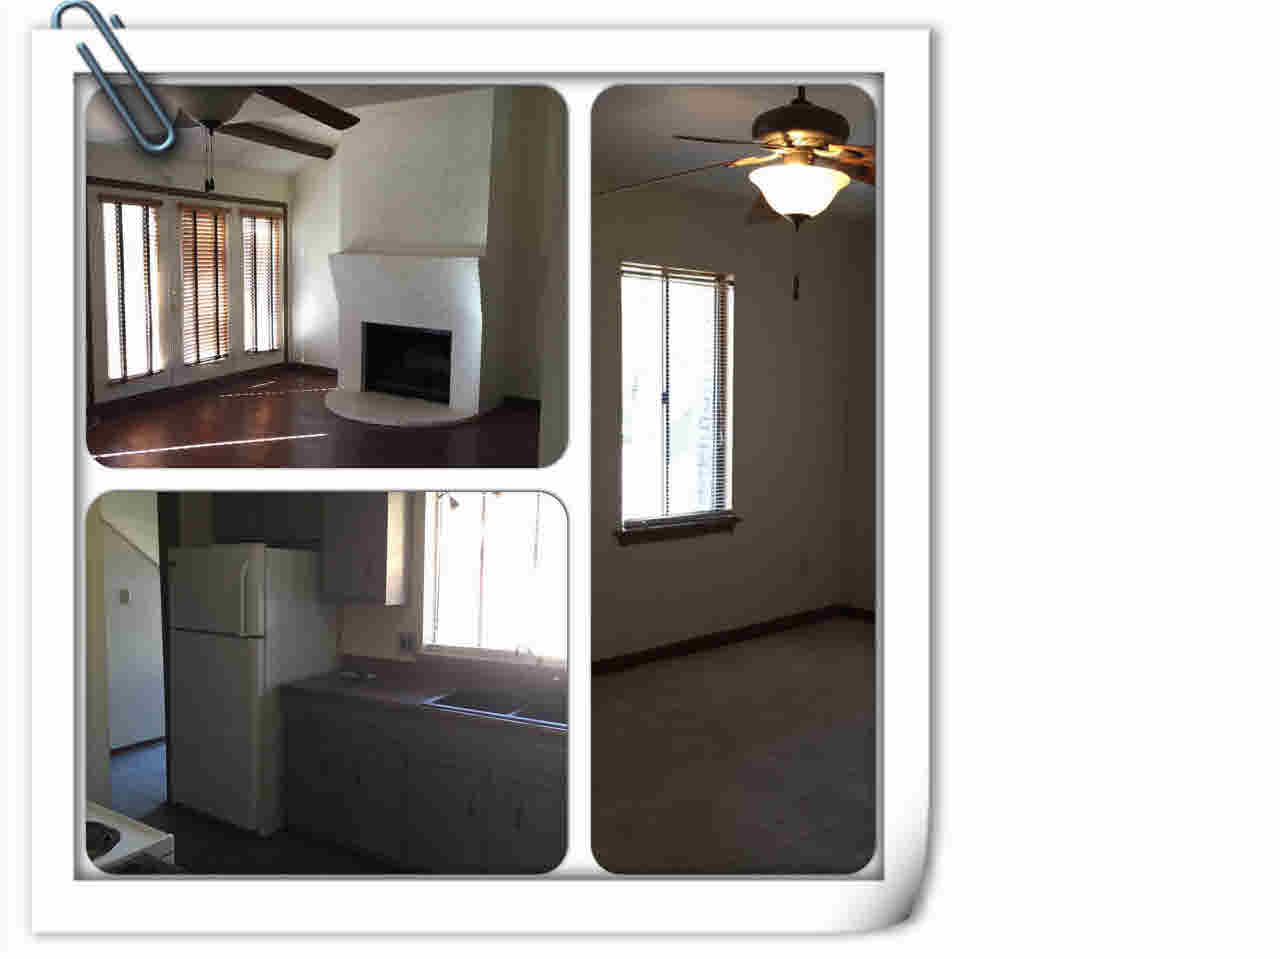 Rental Homes for Rent, ListingId:31963072, location: 1255 E COUNTY LINE RD Jackson 39211